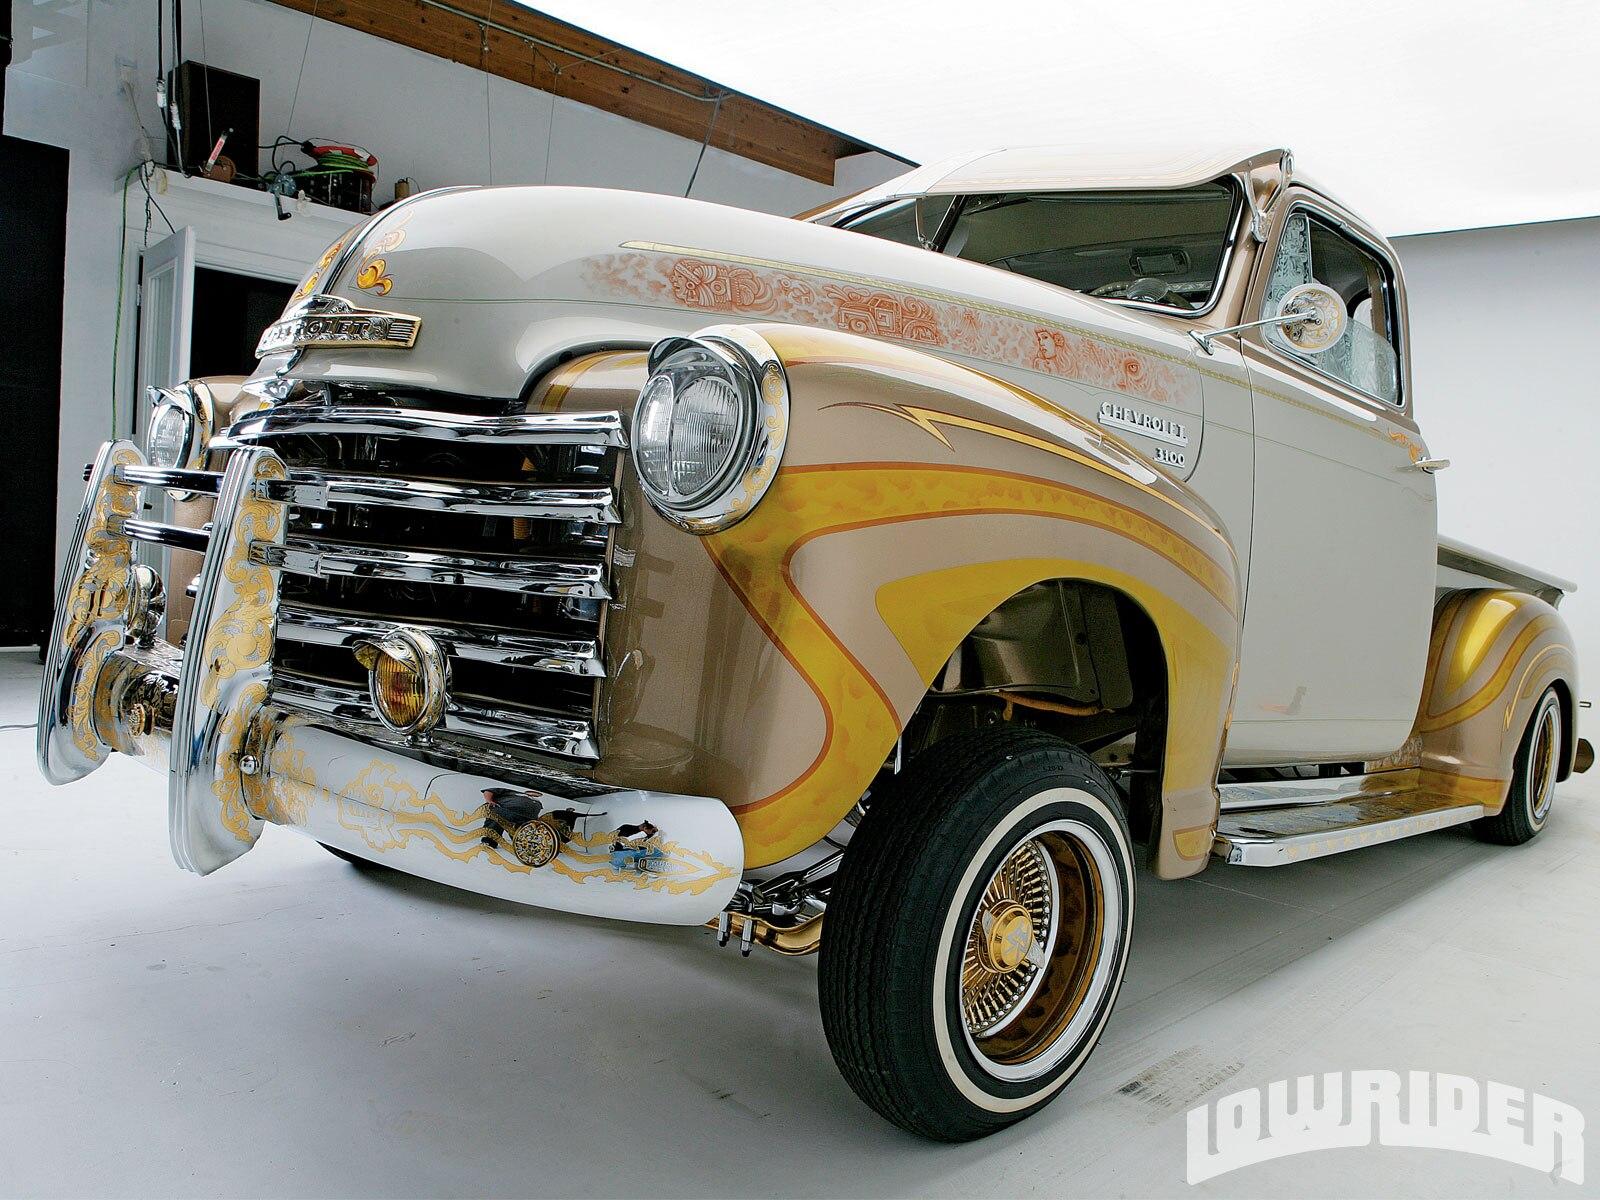 lrmp-1008-08-o-1951-chevrolet-pickup-front-view1